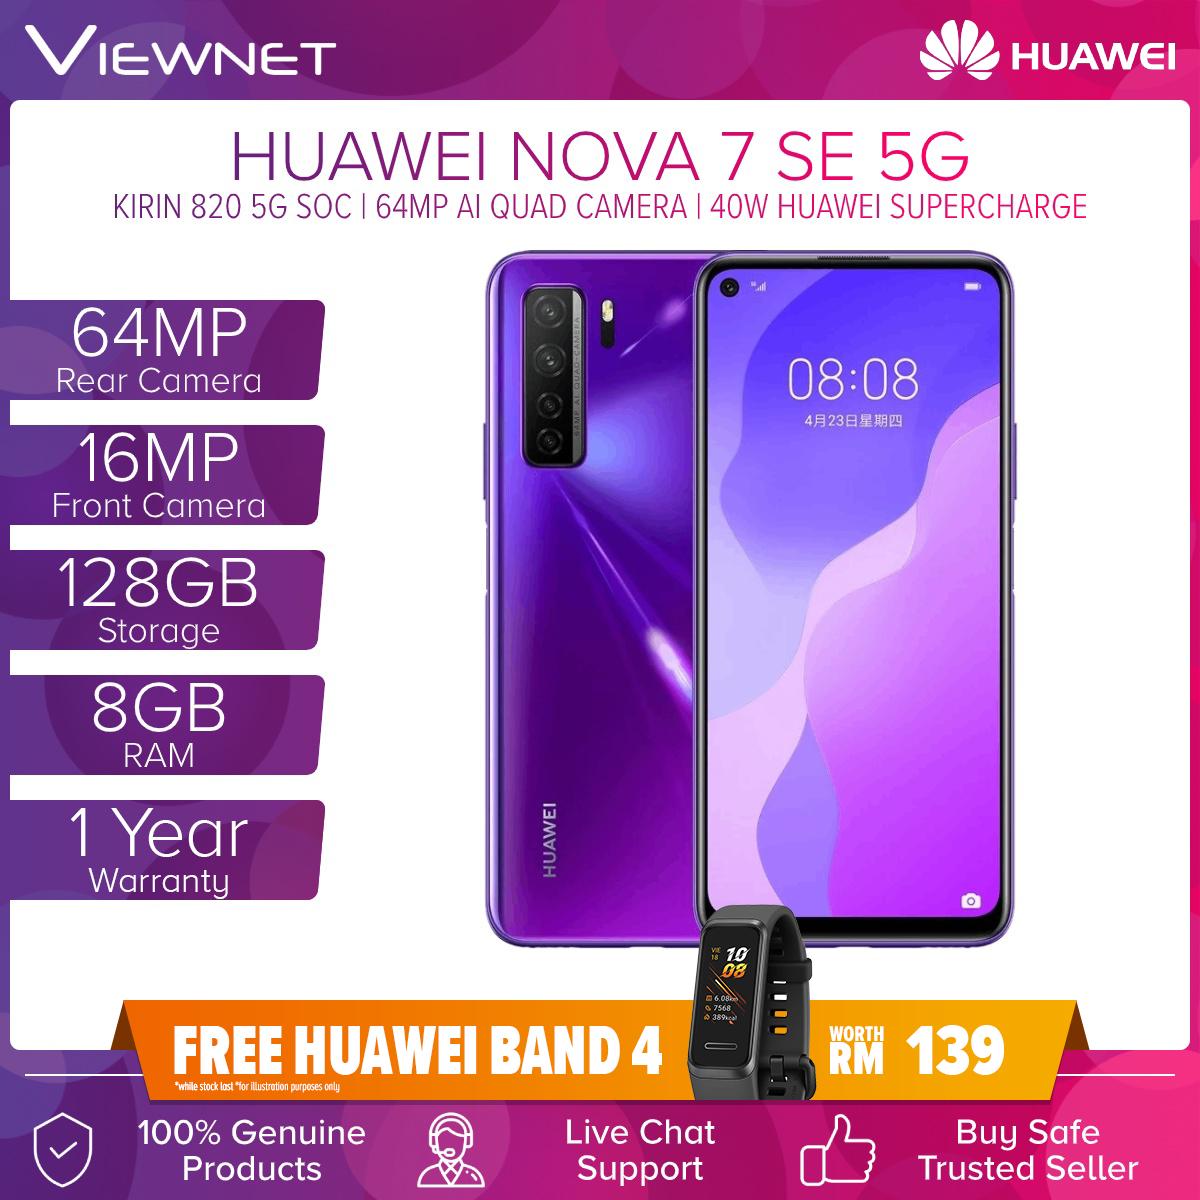 Huawei Nova 7 SE 5G Smartphone (8GB + 128GB) 6.5